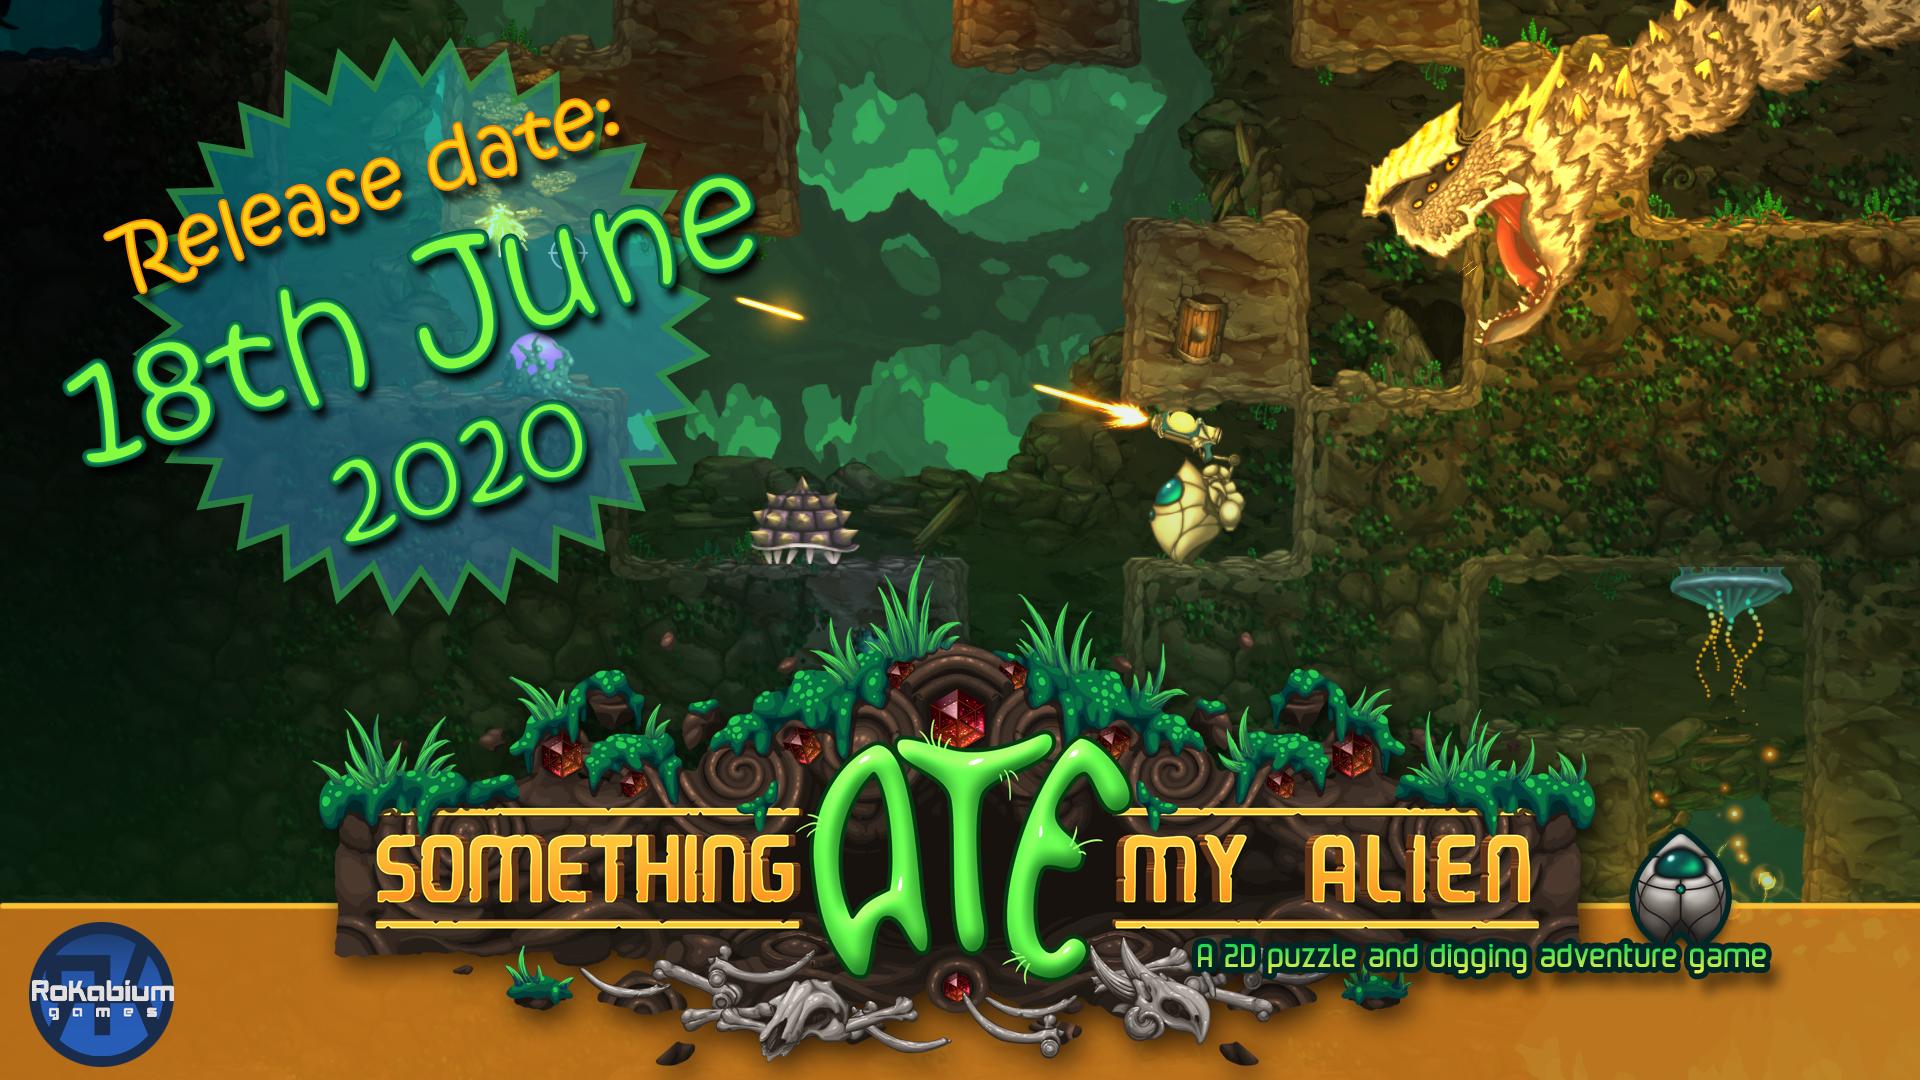 18th June announcement